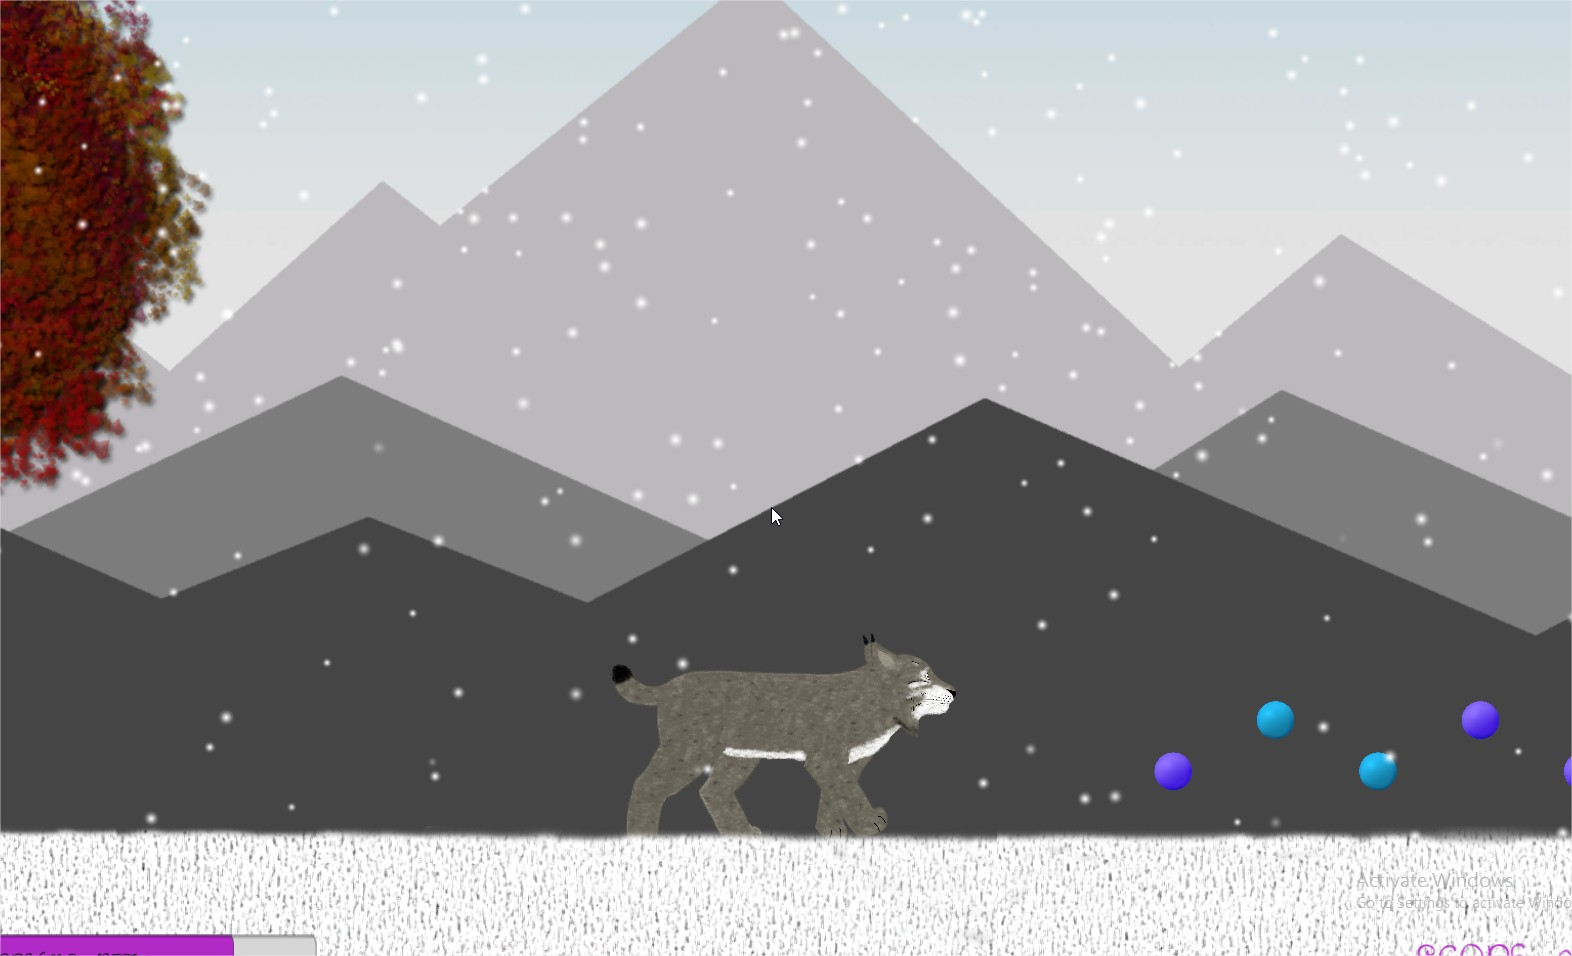 pgi5 - Lynx's Fantasy